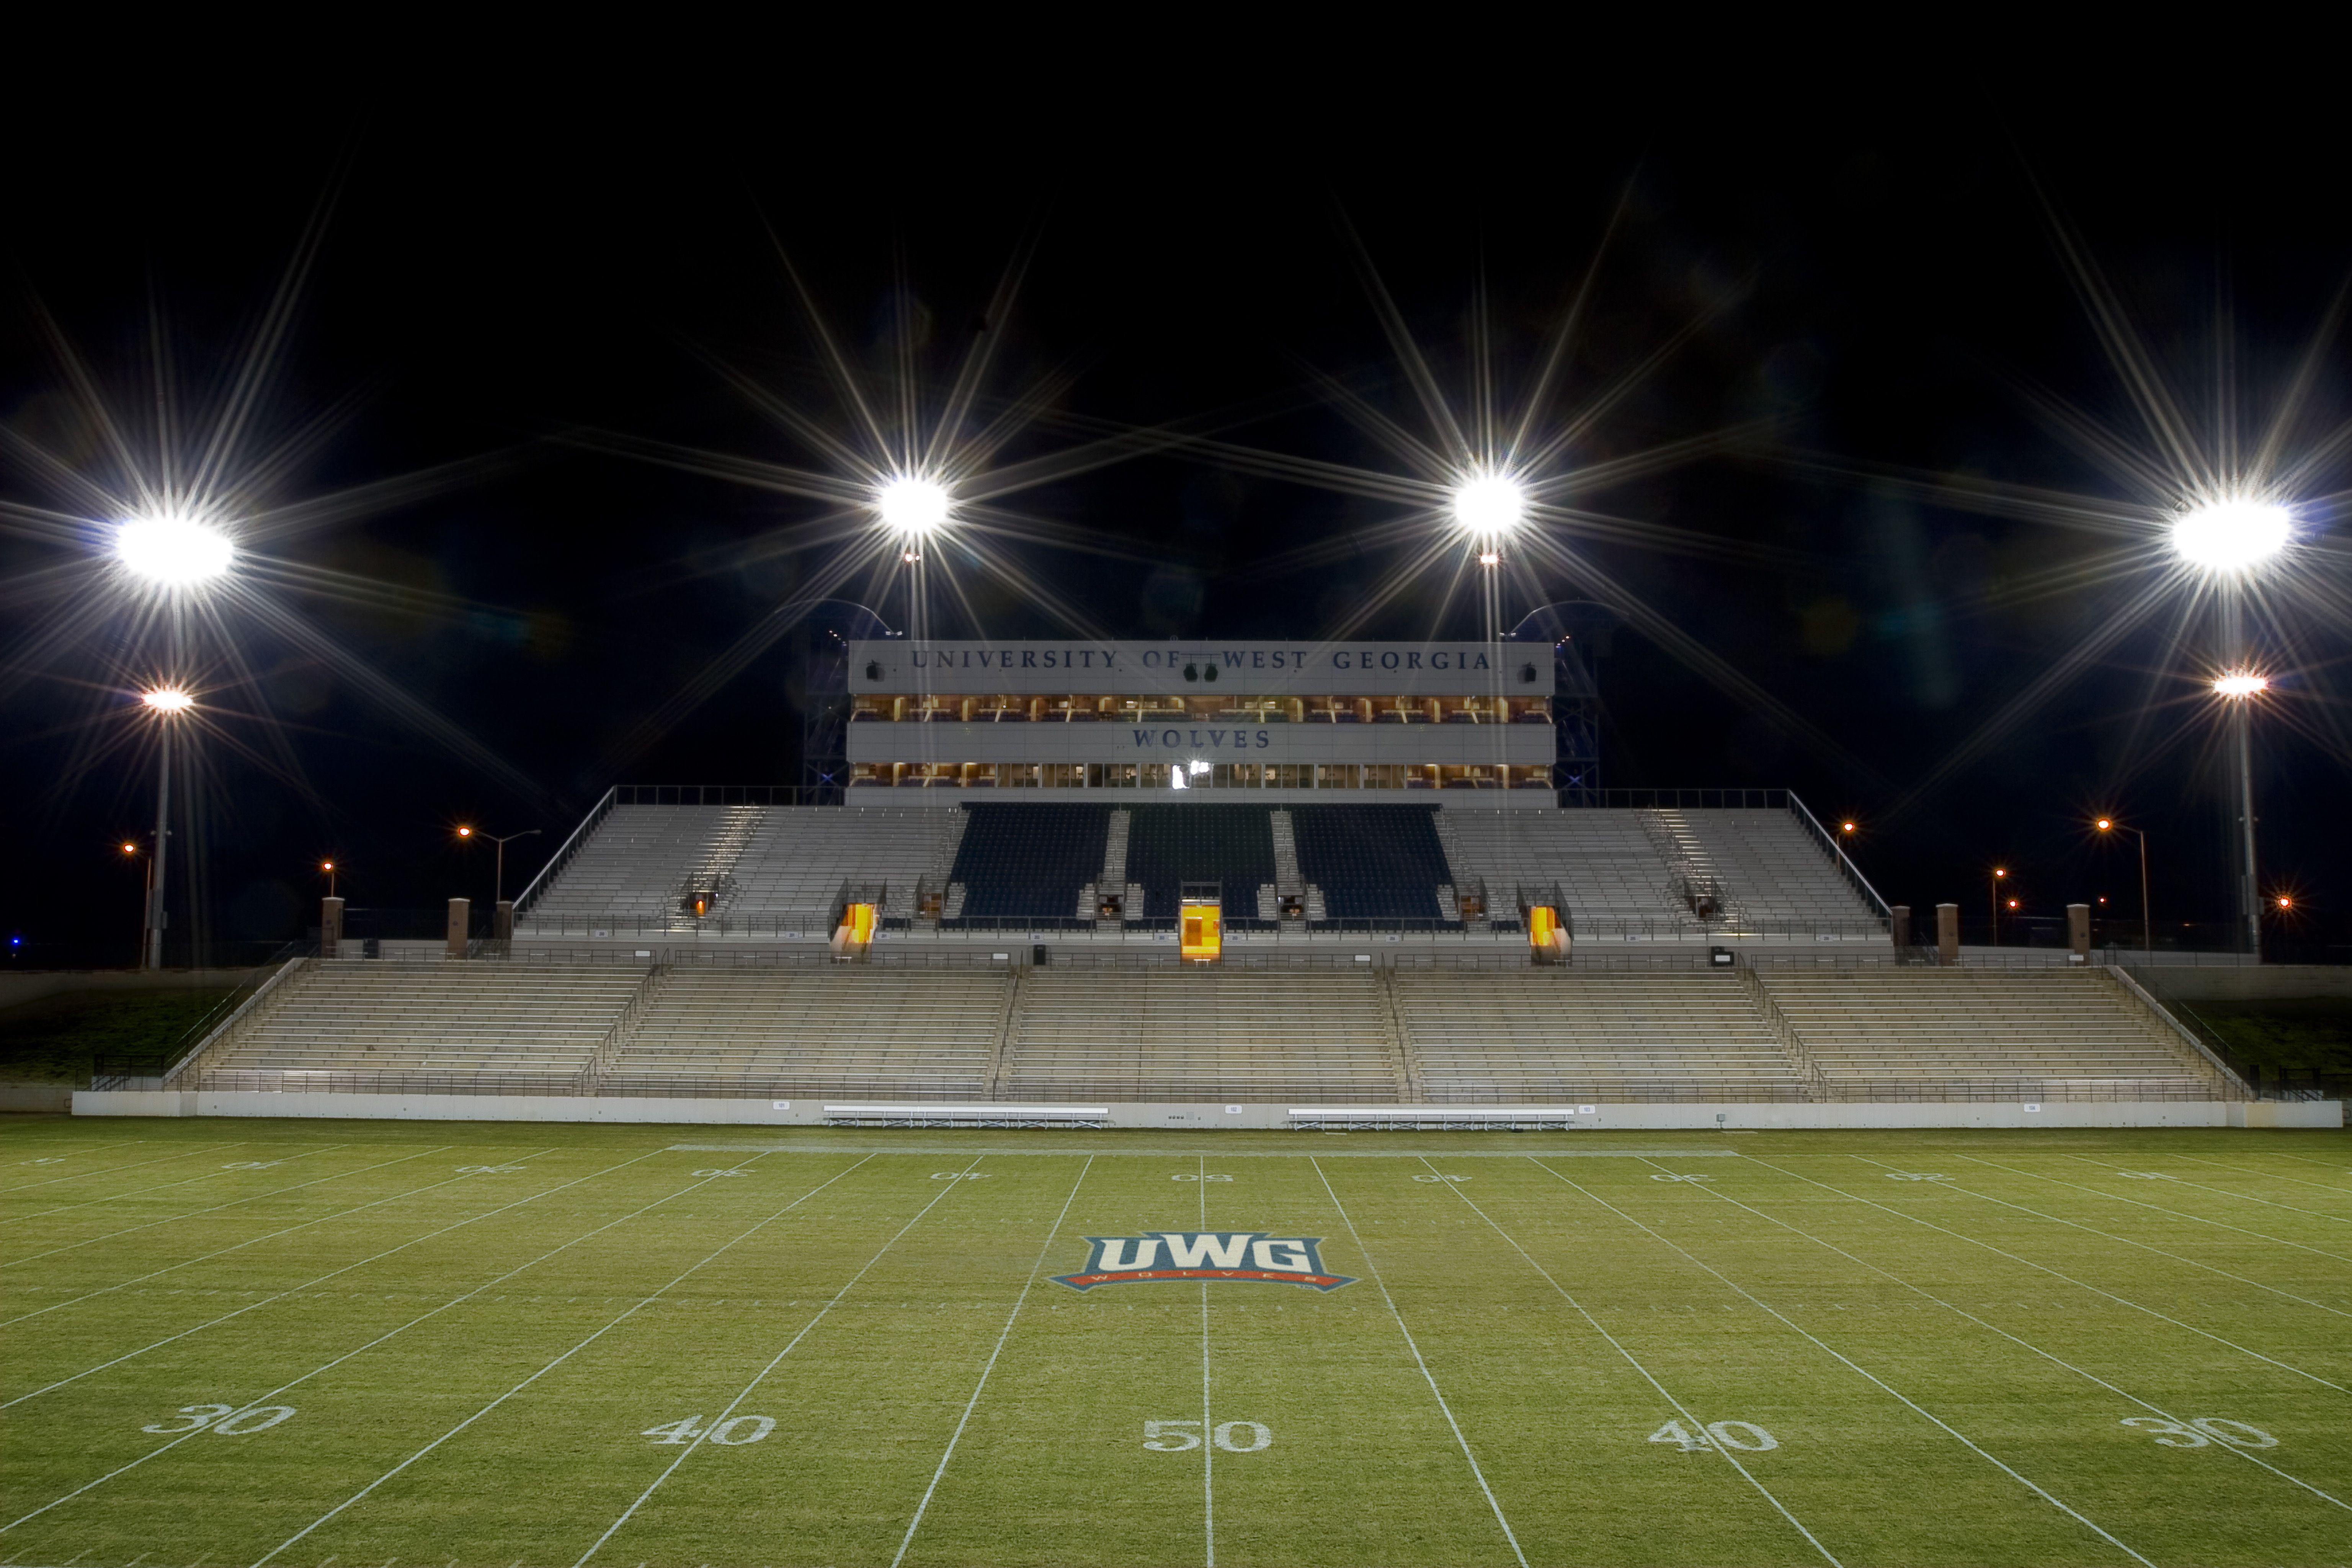 University Stadium At Night Is A Sight To Behold The Football Stadium Is The Centerpiece Of The University Of West Georgia College Football Stadiums Stadium